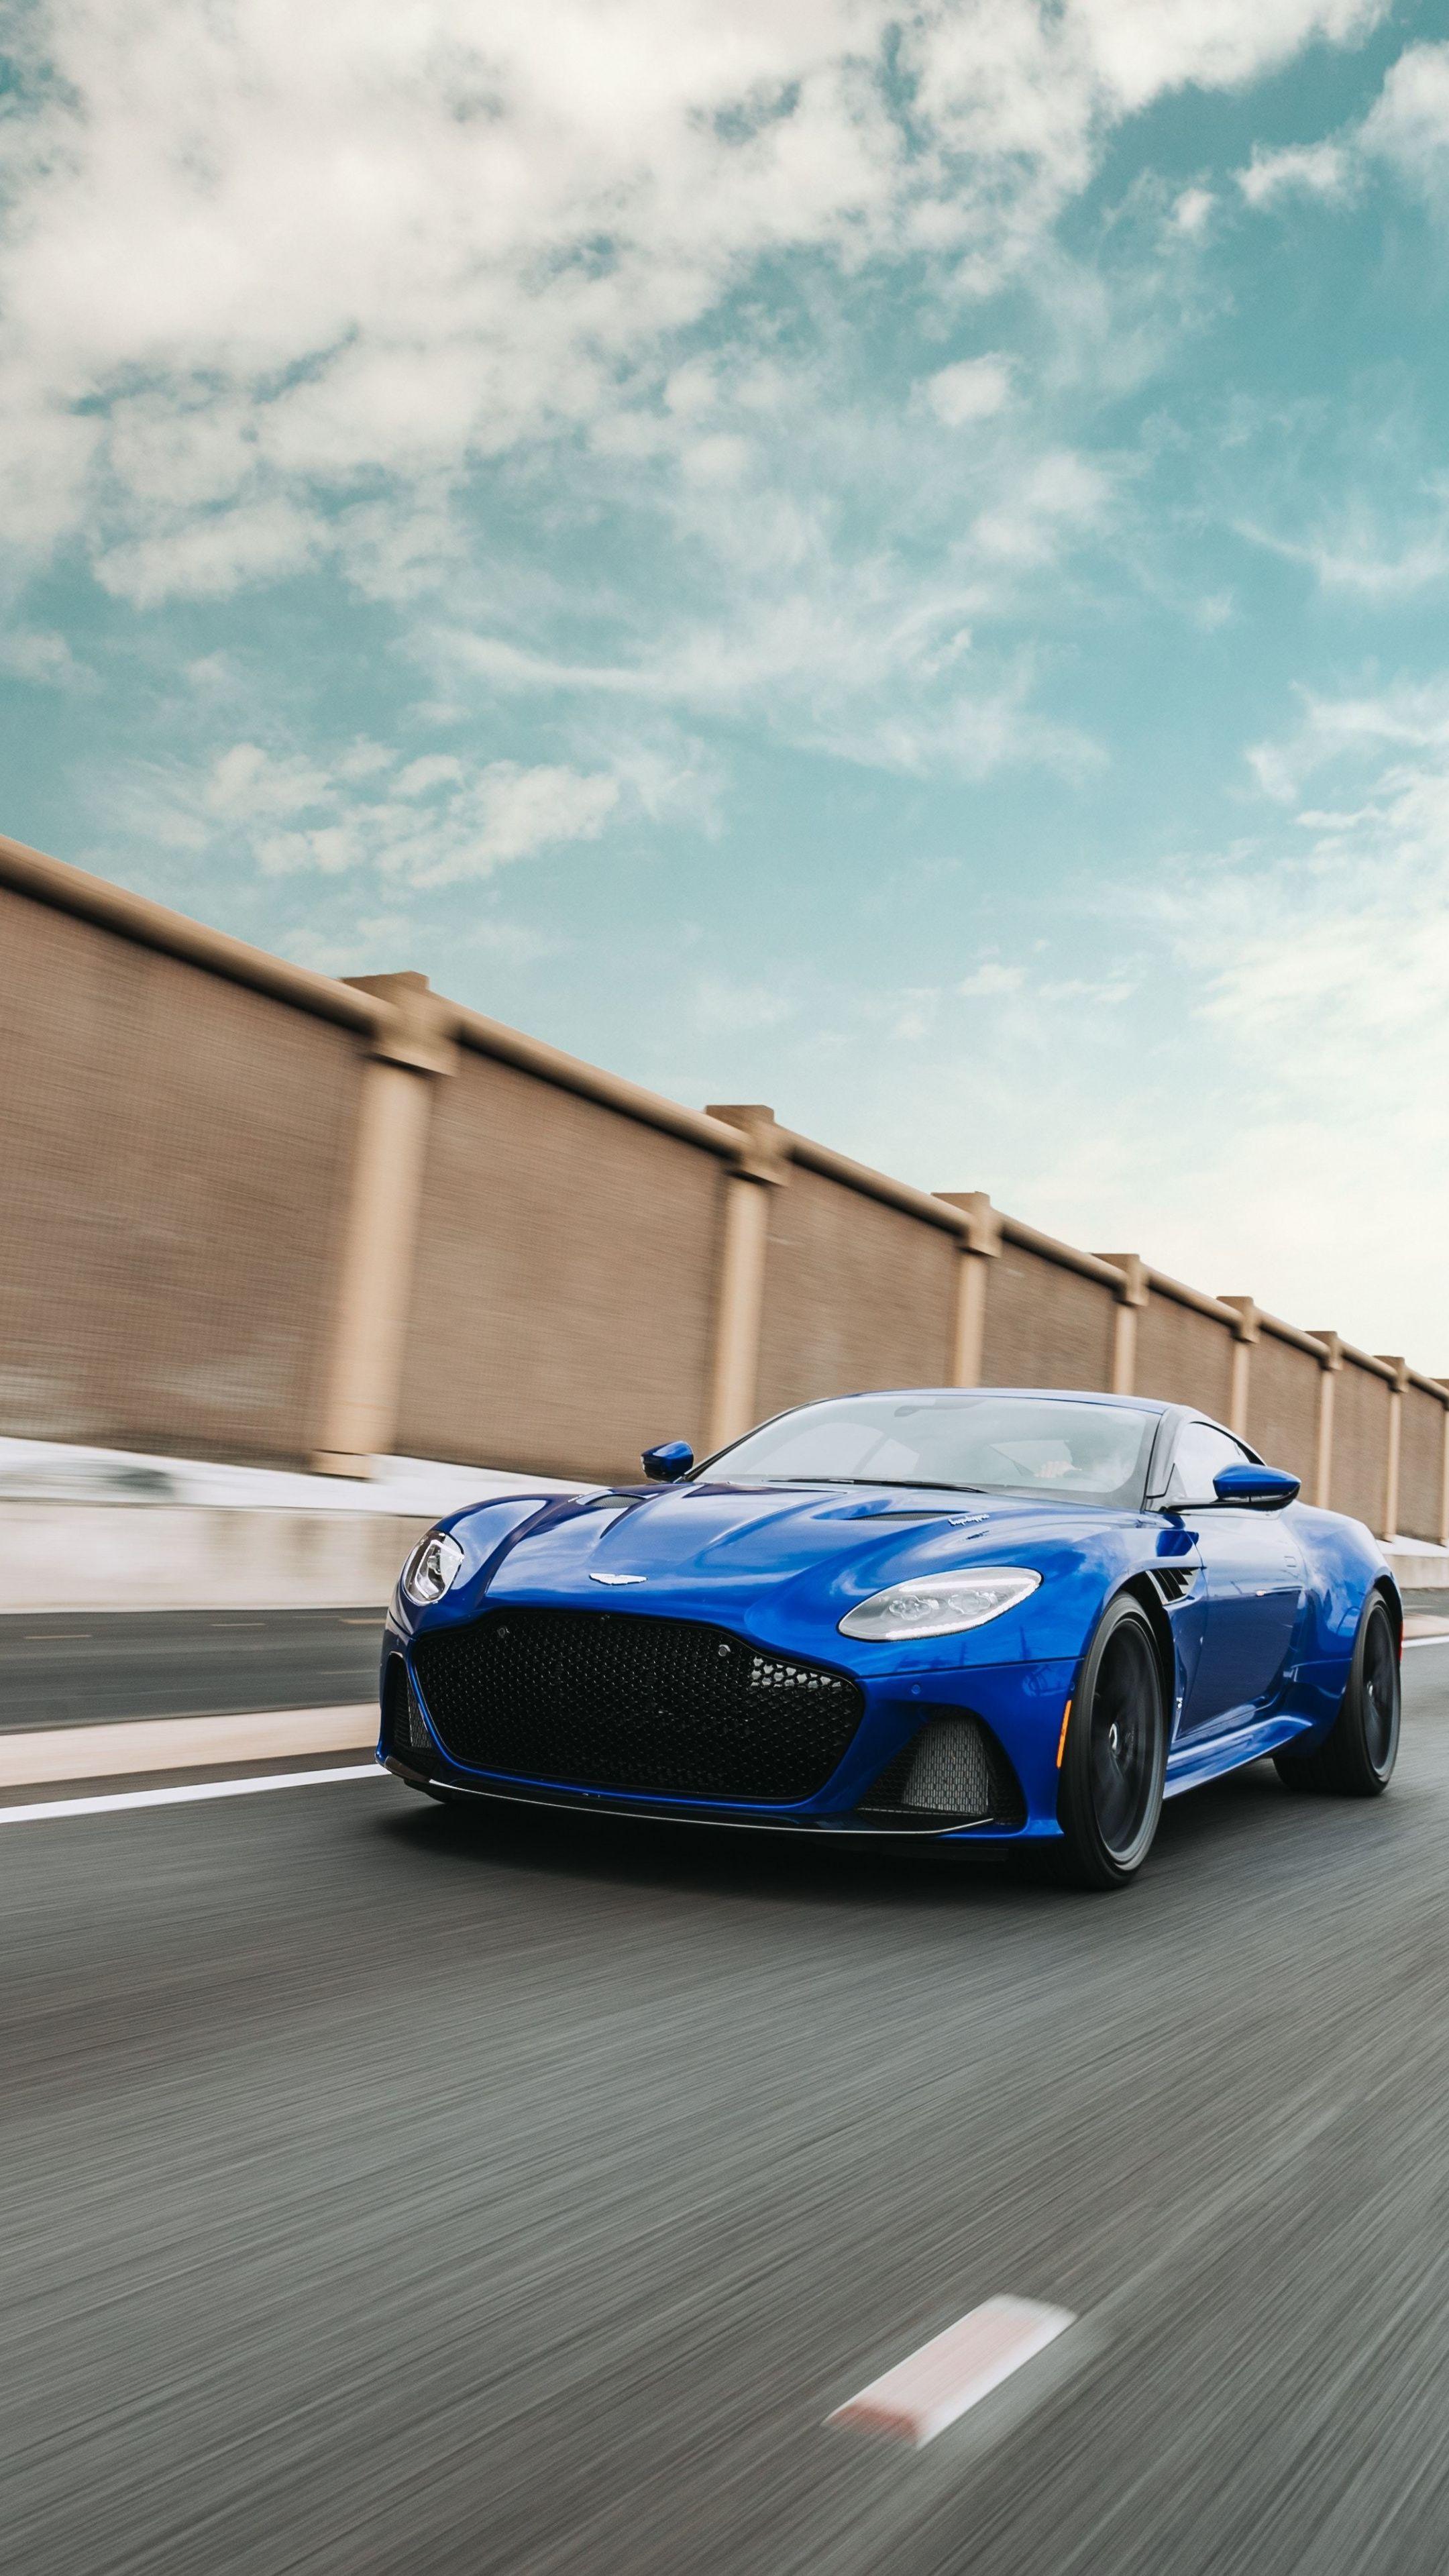 21603840 Aston Martin Blue Sports Car Wallpaper Sports Car Wallpaper Sports Car Aston Martin